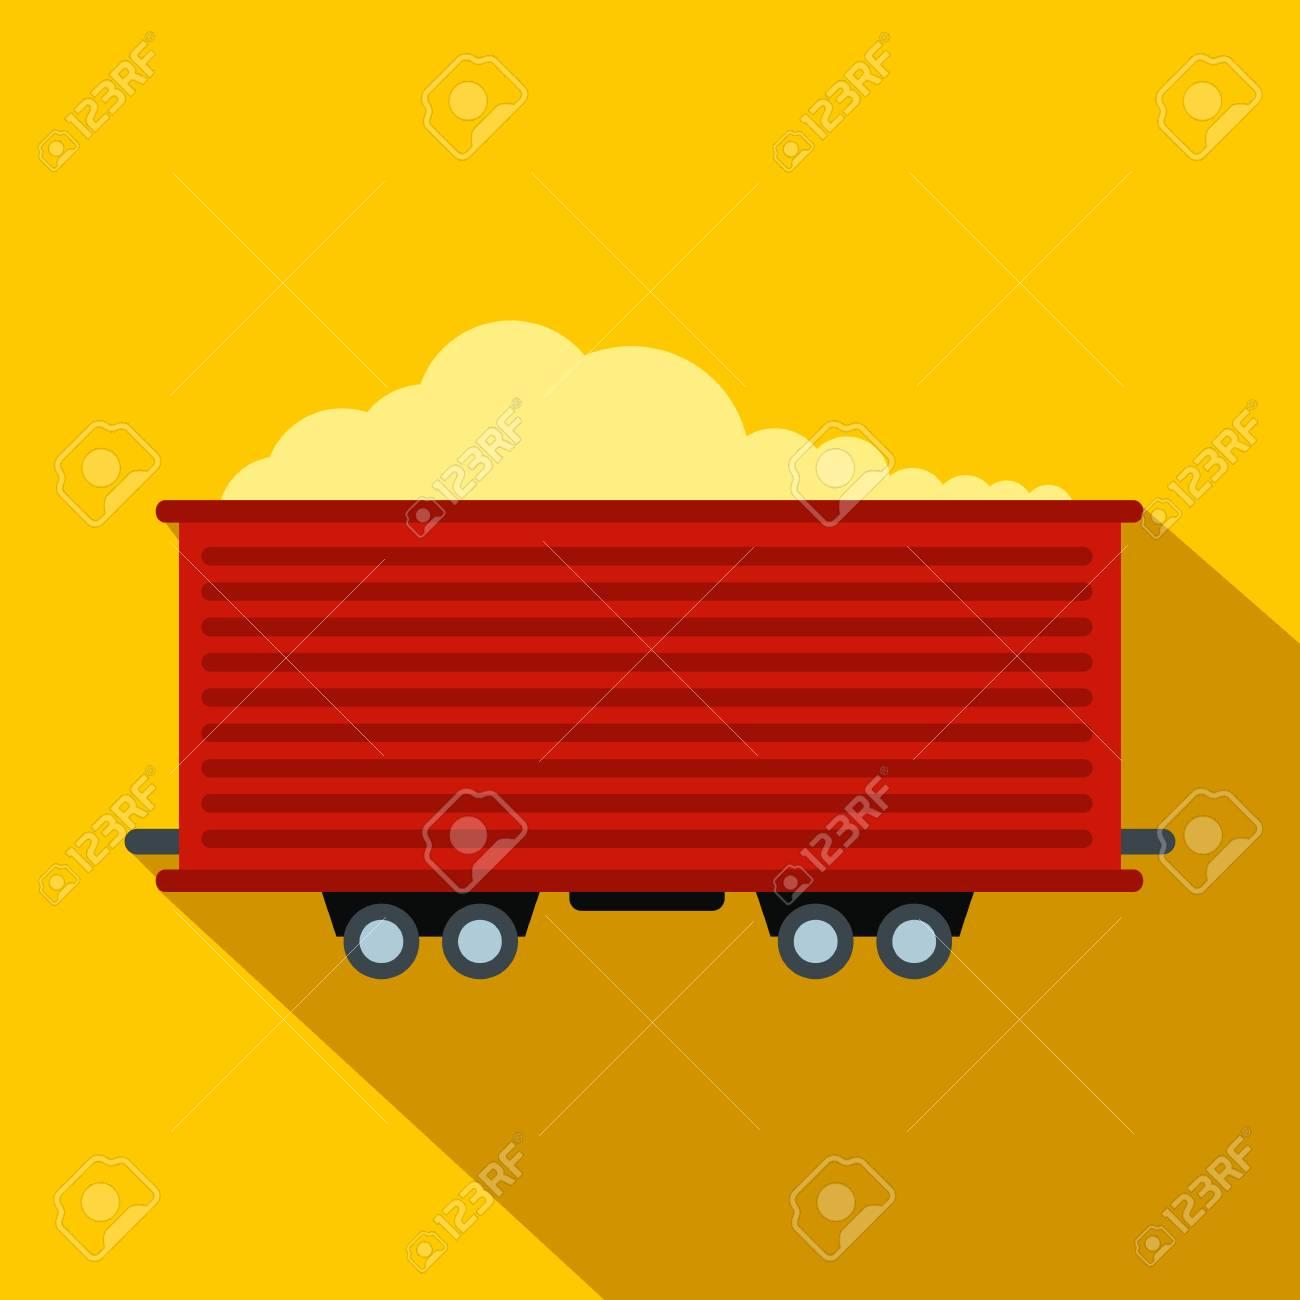 Open rail car flat icon  Single symbol on a yellow background